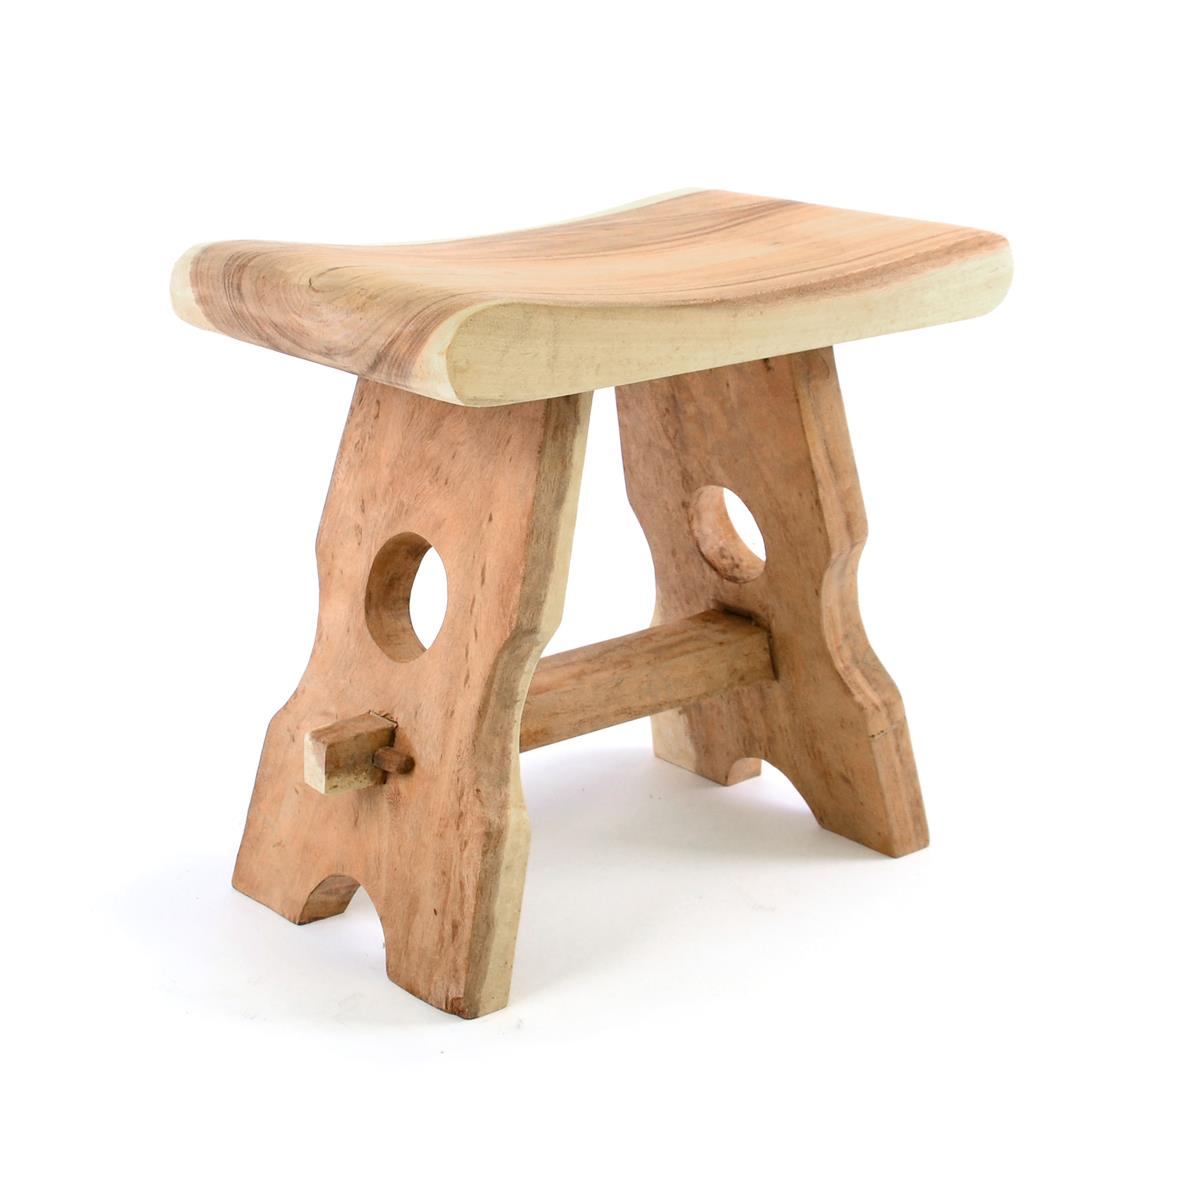 DIVERO Hocker aus Suar Holz unbehandelt massiv Handarbeit Landhausstil natur